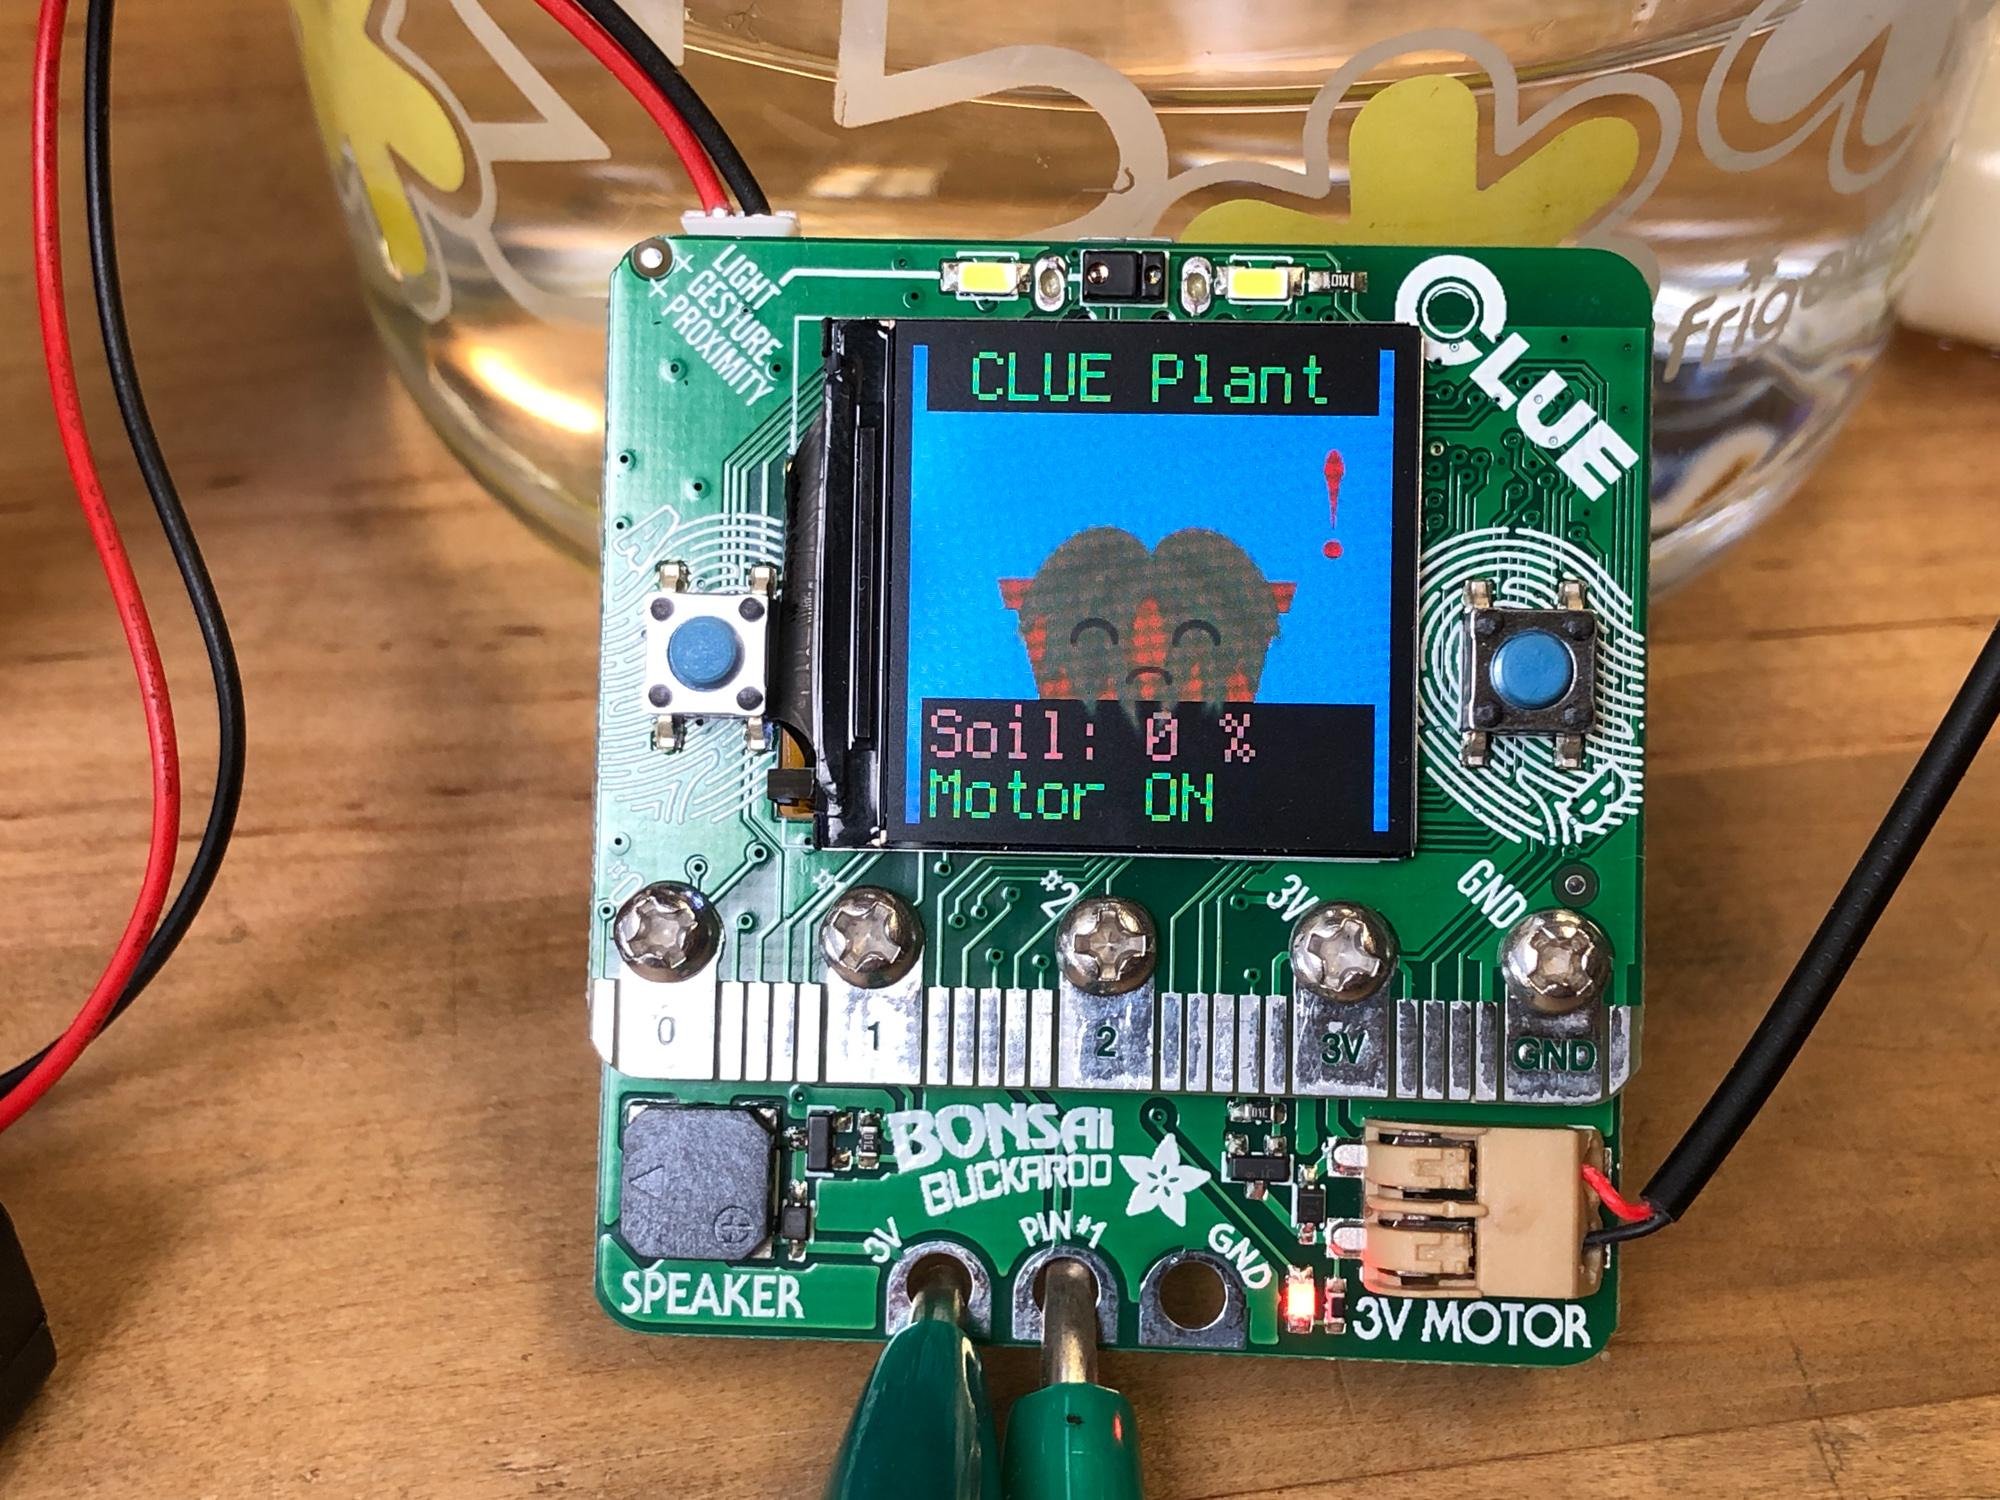 sensors_plant-1321.jpg